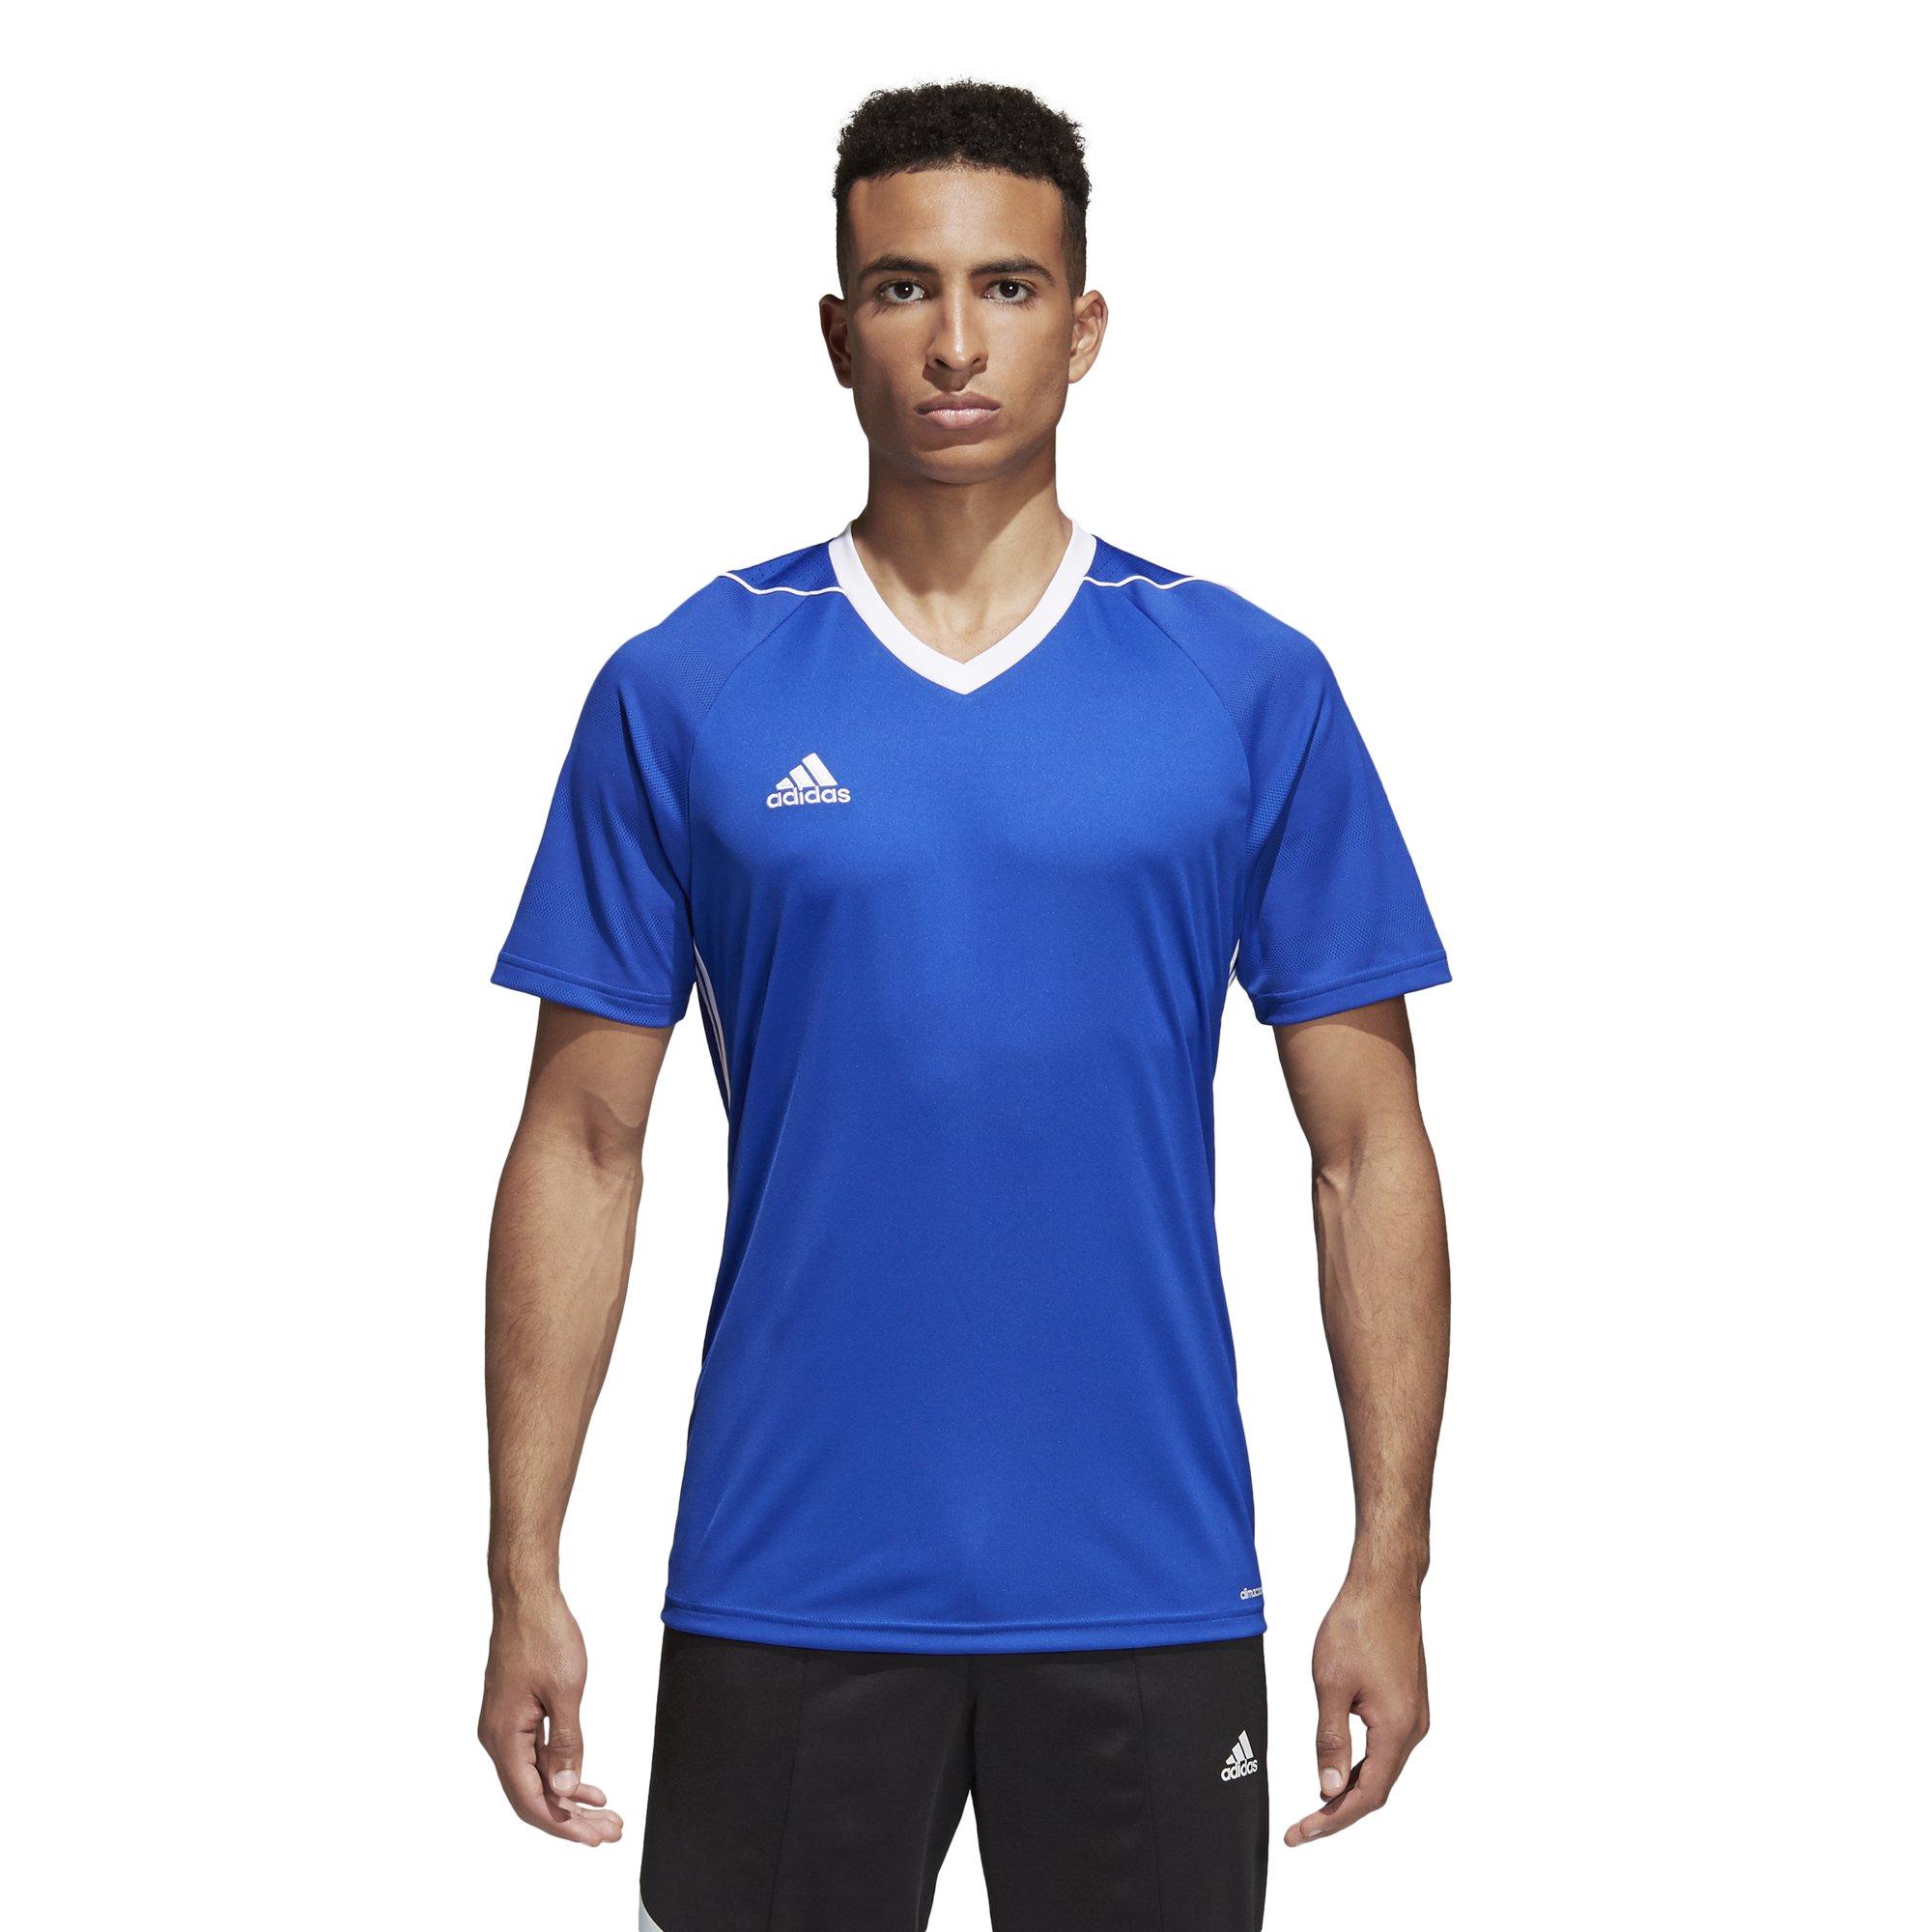 Adidas Tiro 17 Mens Soccer Jersey 2XL Bold Blue/White by adidas